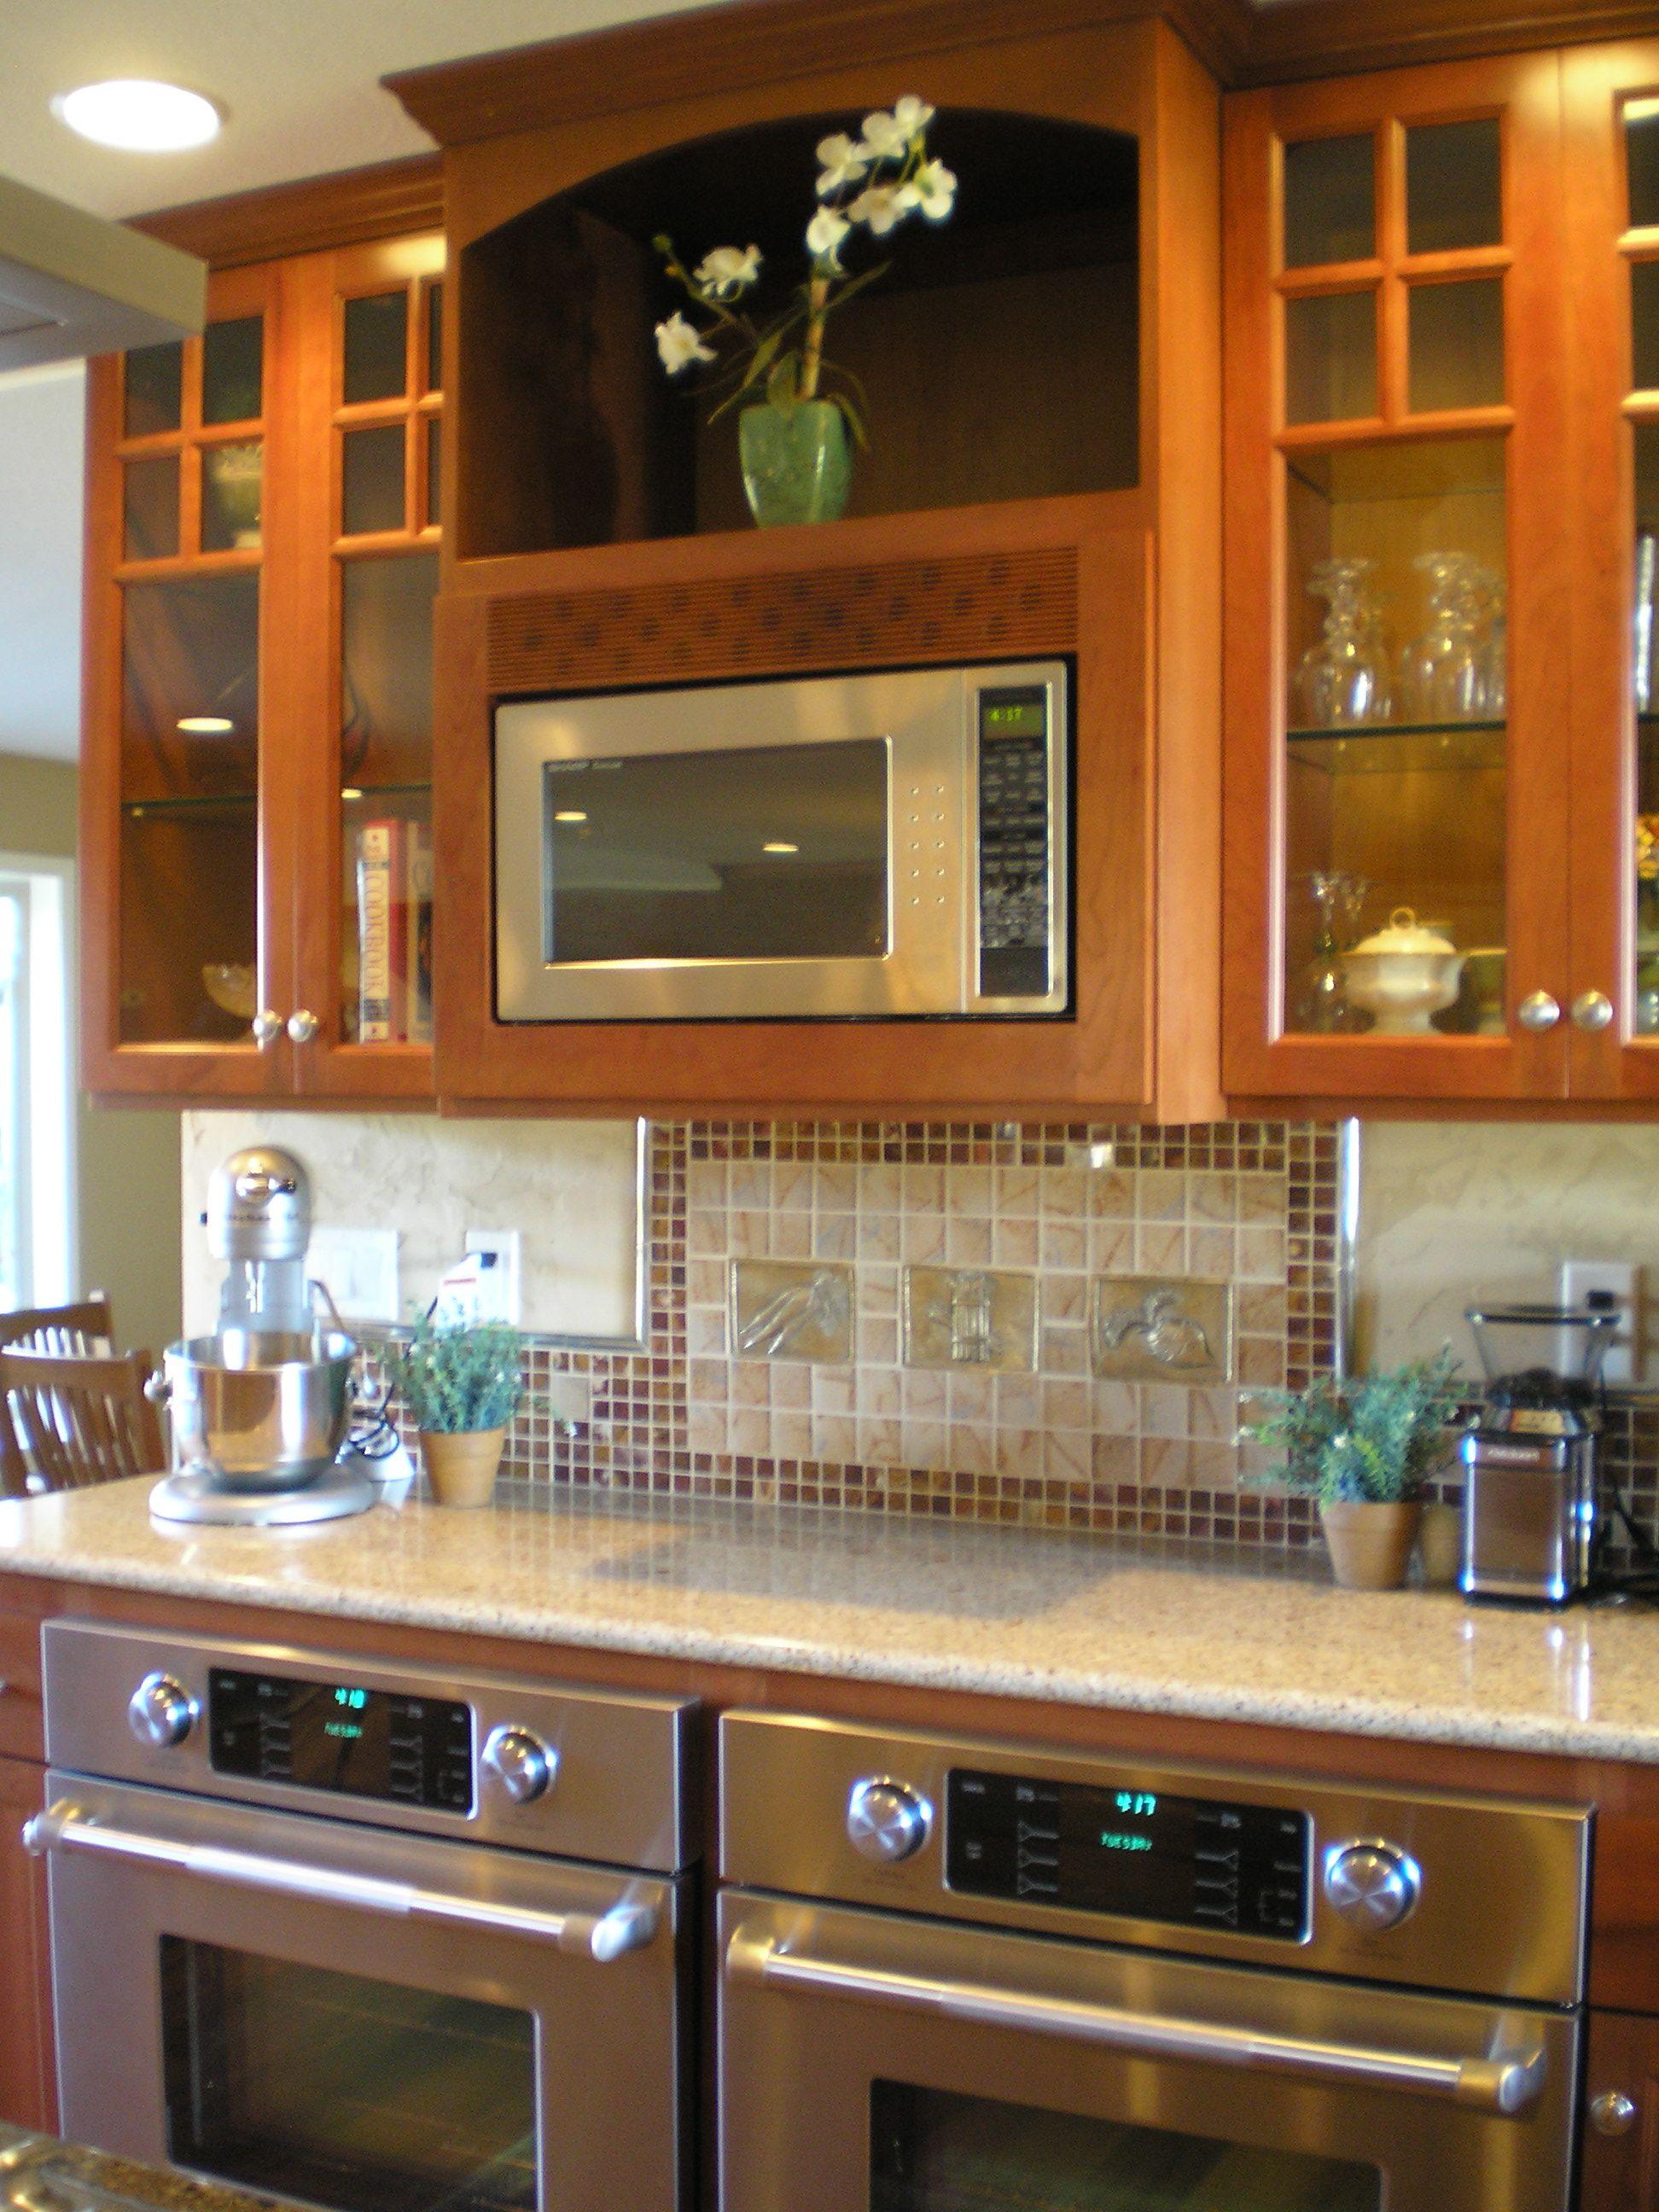 Damascus Kitchen Remodel Granite Countertops Cherry Cabinets